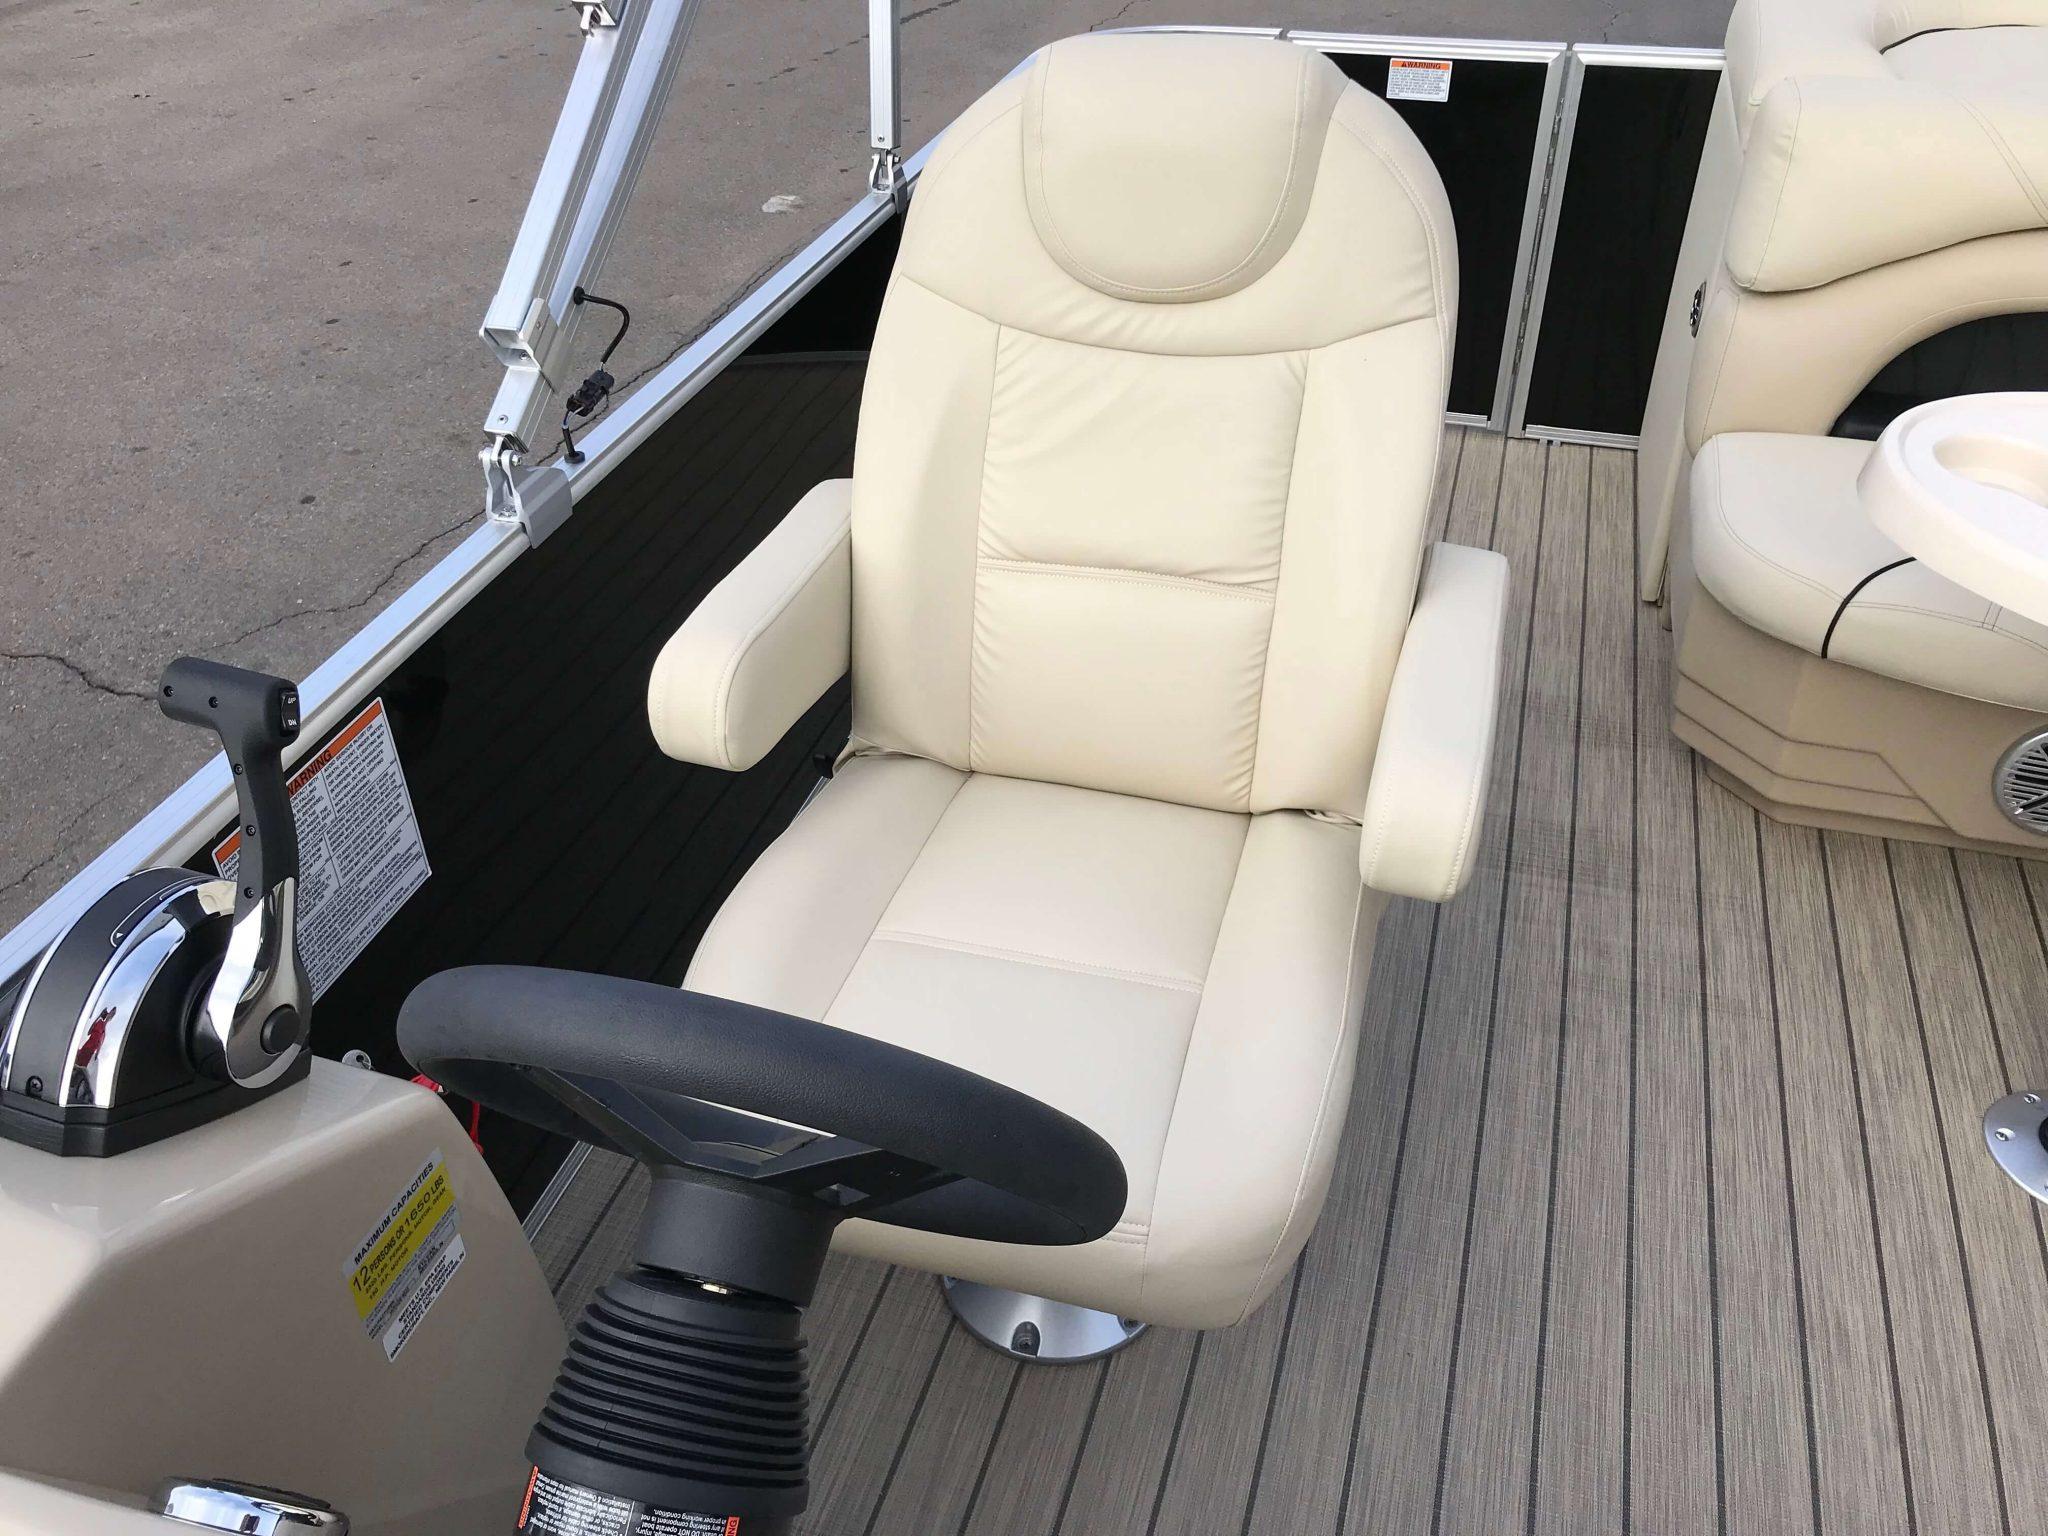 2019 Sylvan Mirage 8522 Cruise Captains Chair